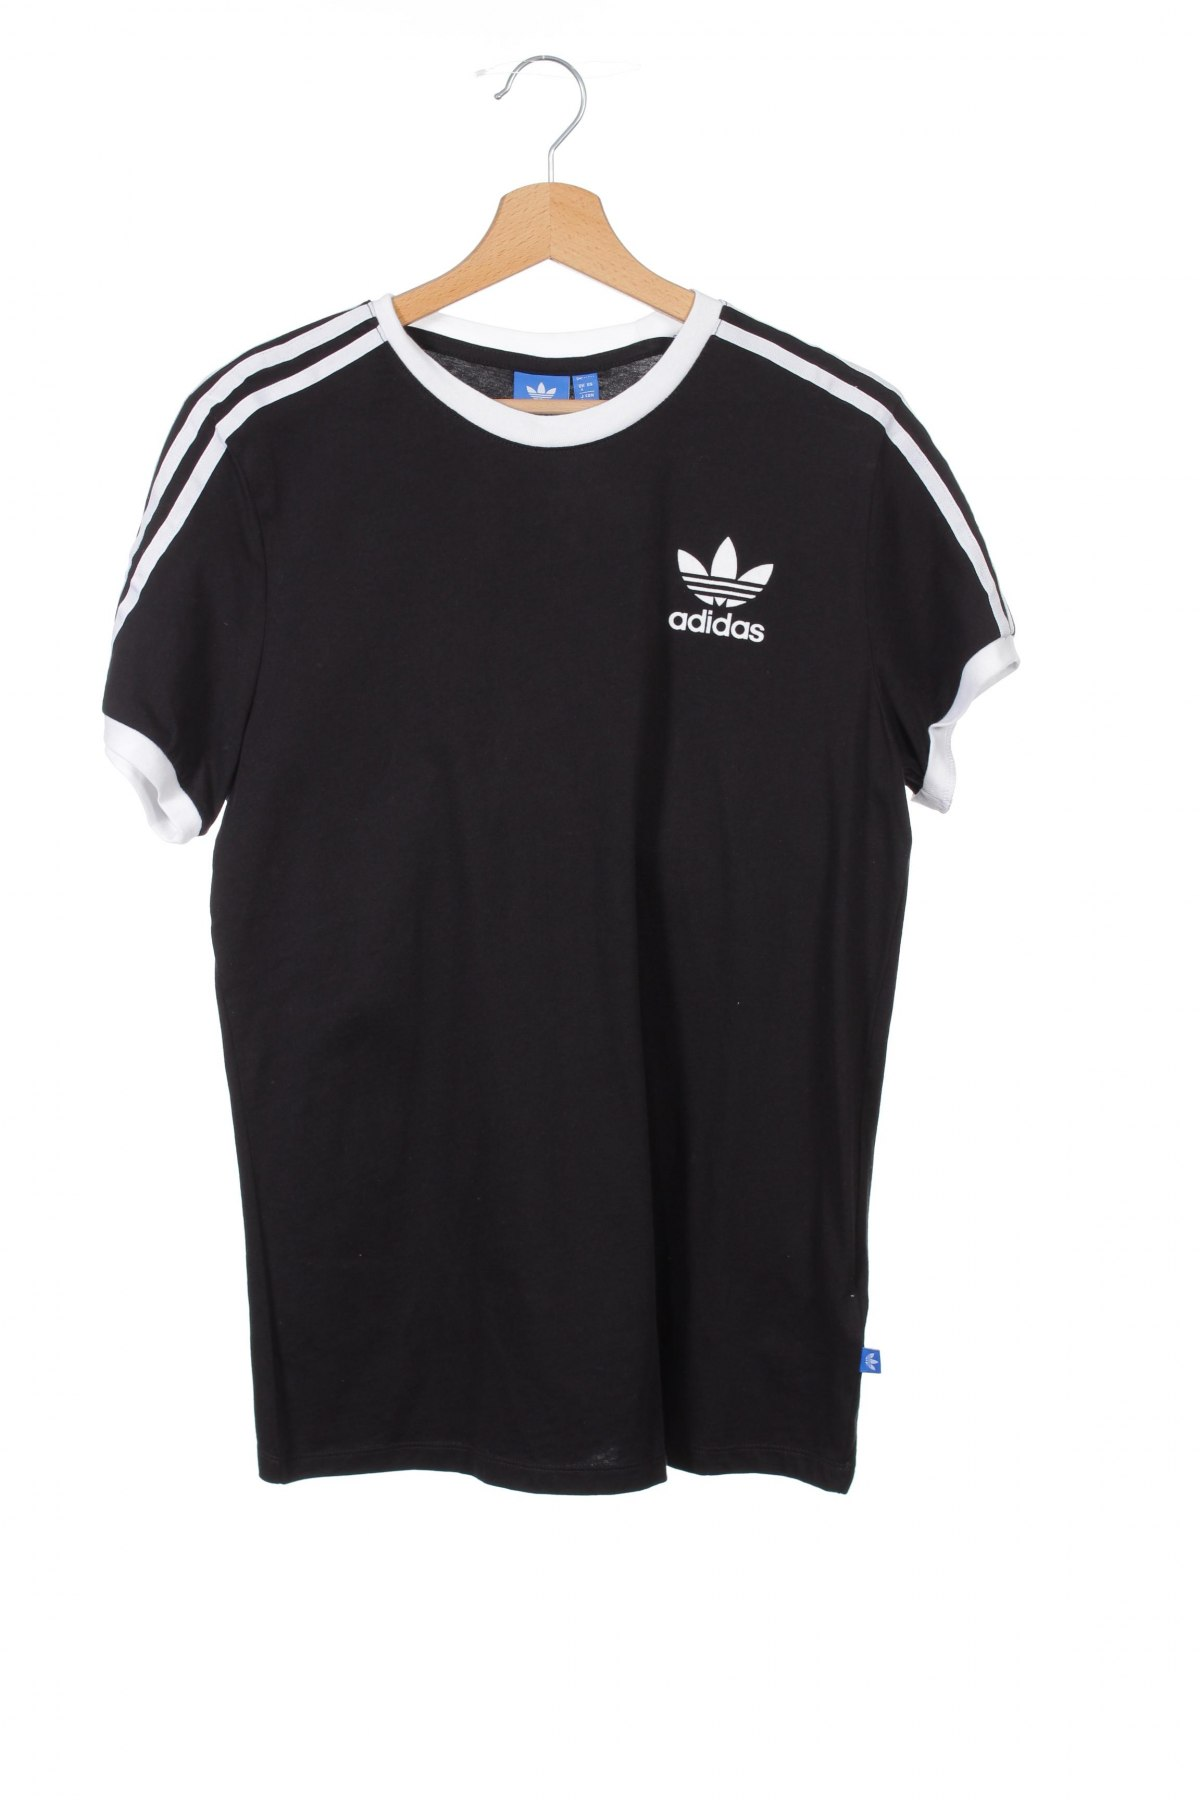 f487b8aa28f0 Női póló Adidas Originals - kedvező áron Remixben - #100490814